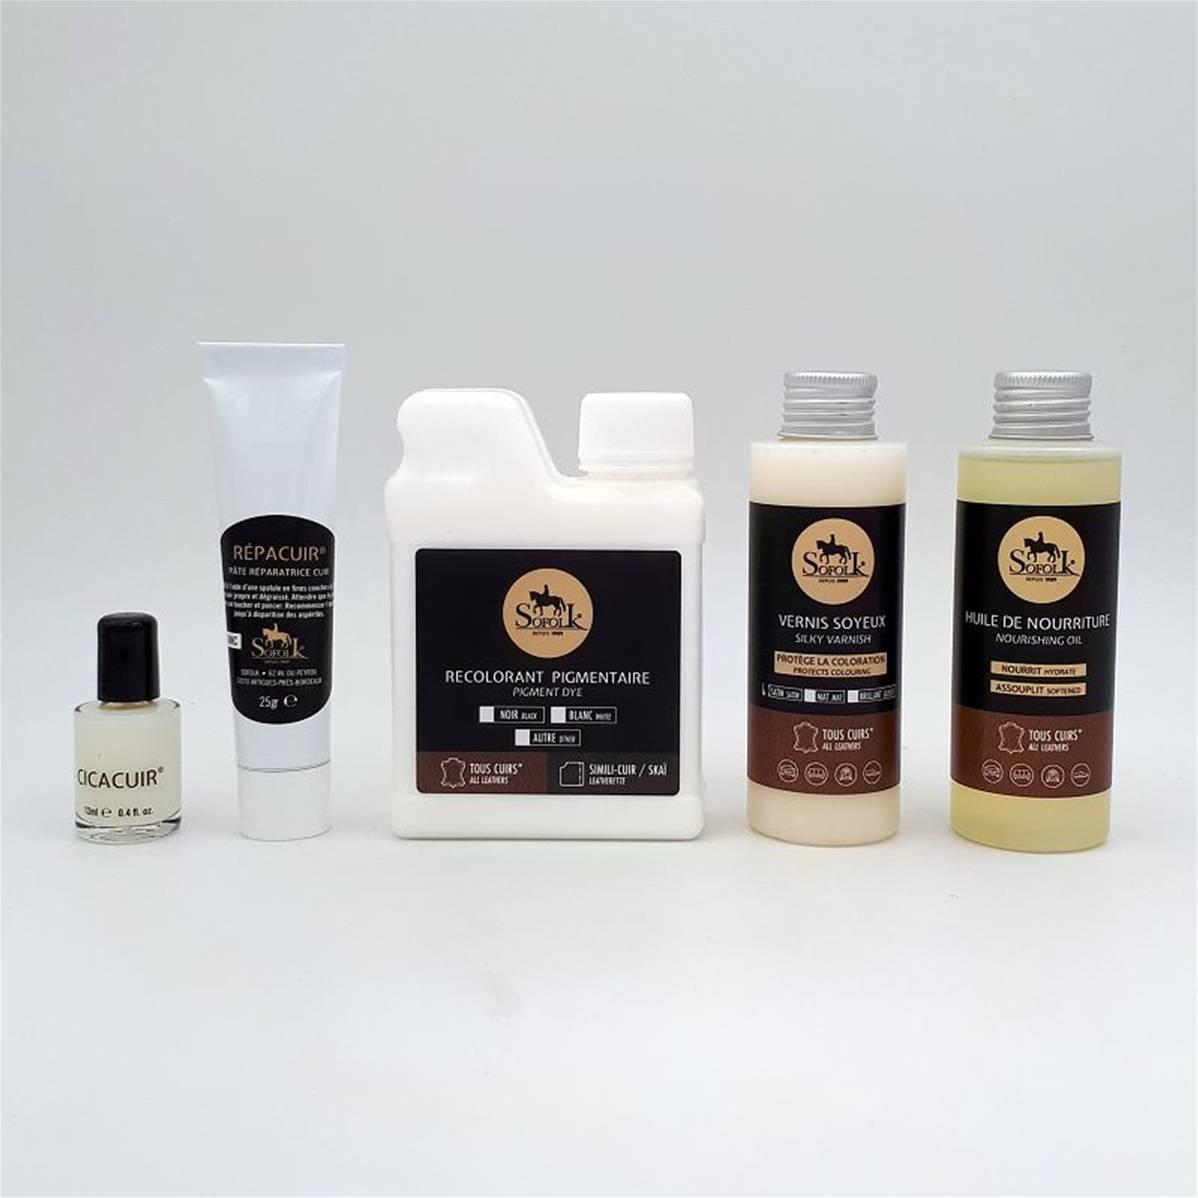 kit de r novation pour si ge en cuir noir r f rence sofkscn de jaguar xk8 1997 2006 v8 essence. Black Bedroom Furniture Sets. Home Design Ideas